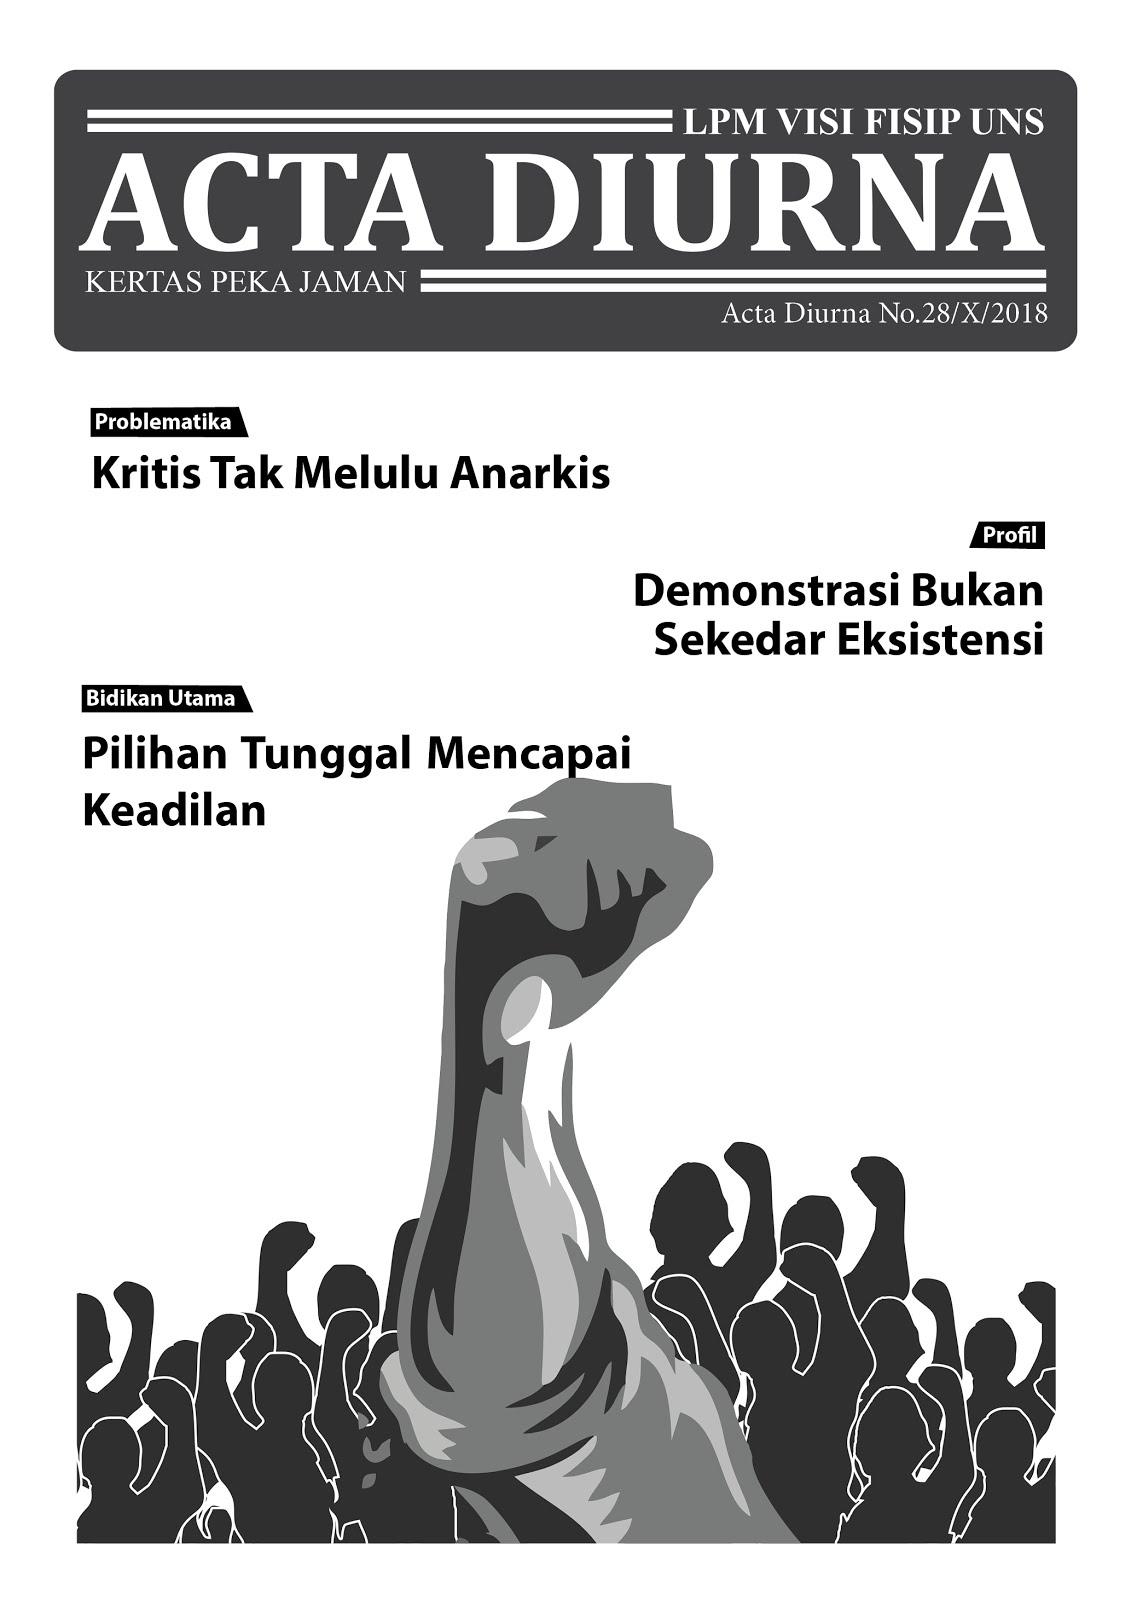 Buletin Acta Diurna 28